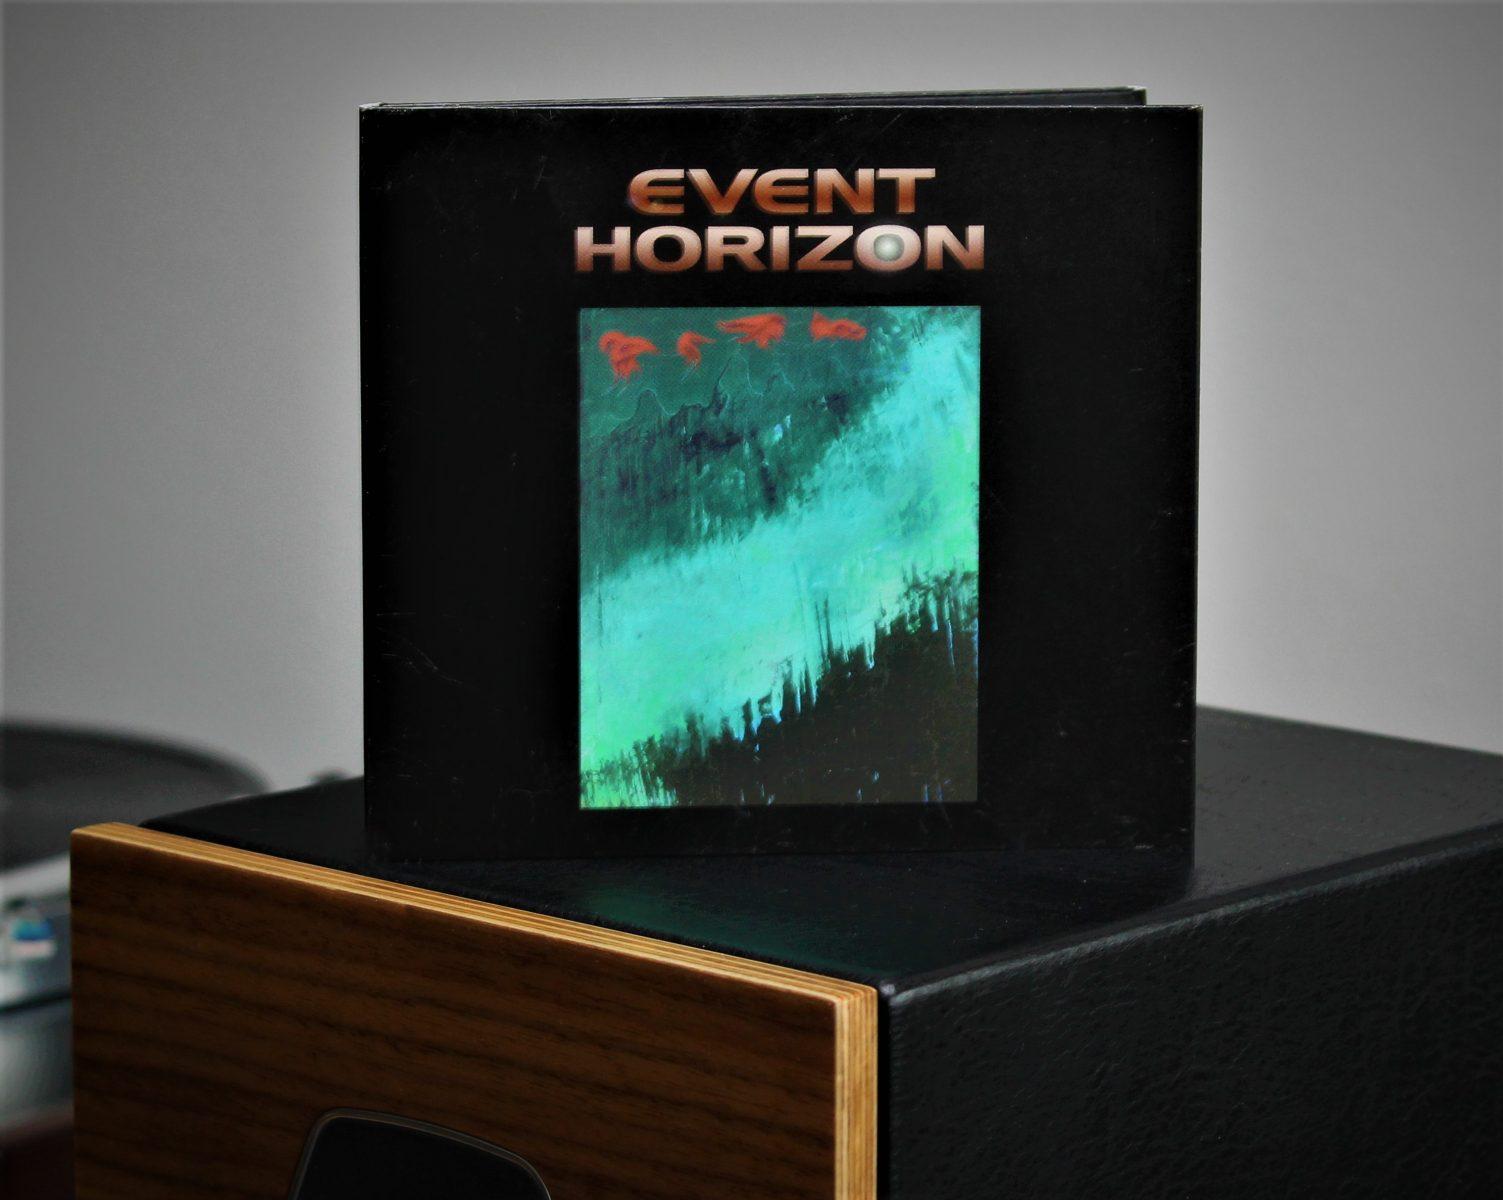 Event Horizon Jazz Quartet, Event Horizon | The Vinyl Anachronist